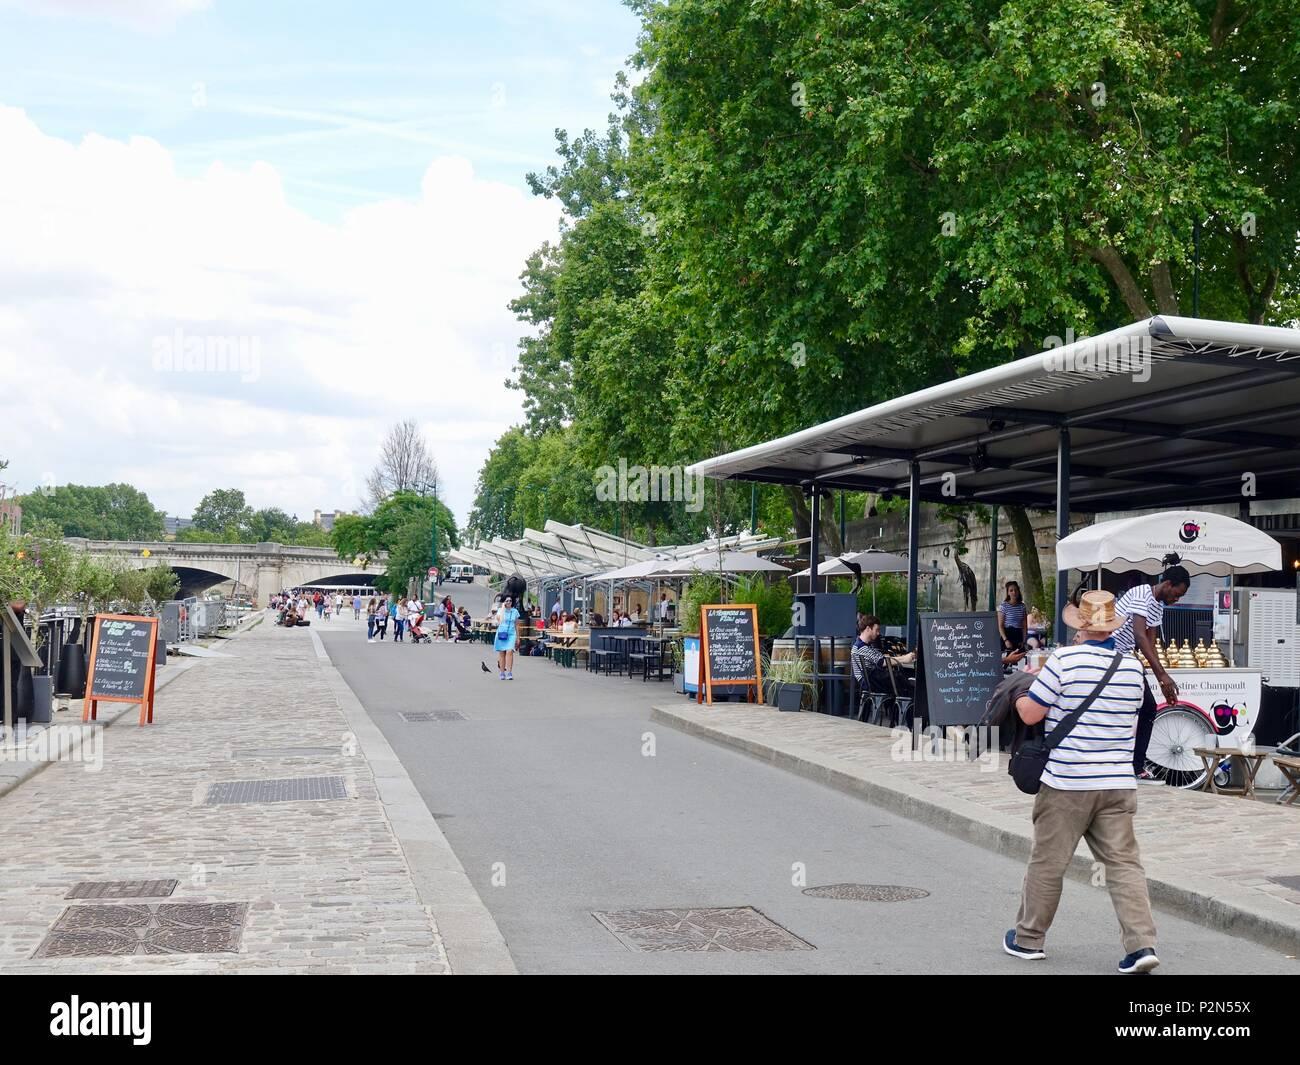 People walking, eating, drinking, working, along the riverside on the Rive Gauche, left bank, Promenade Berges de la Seine, Paris, France - Stock Image